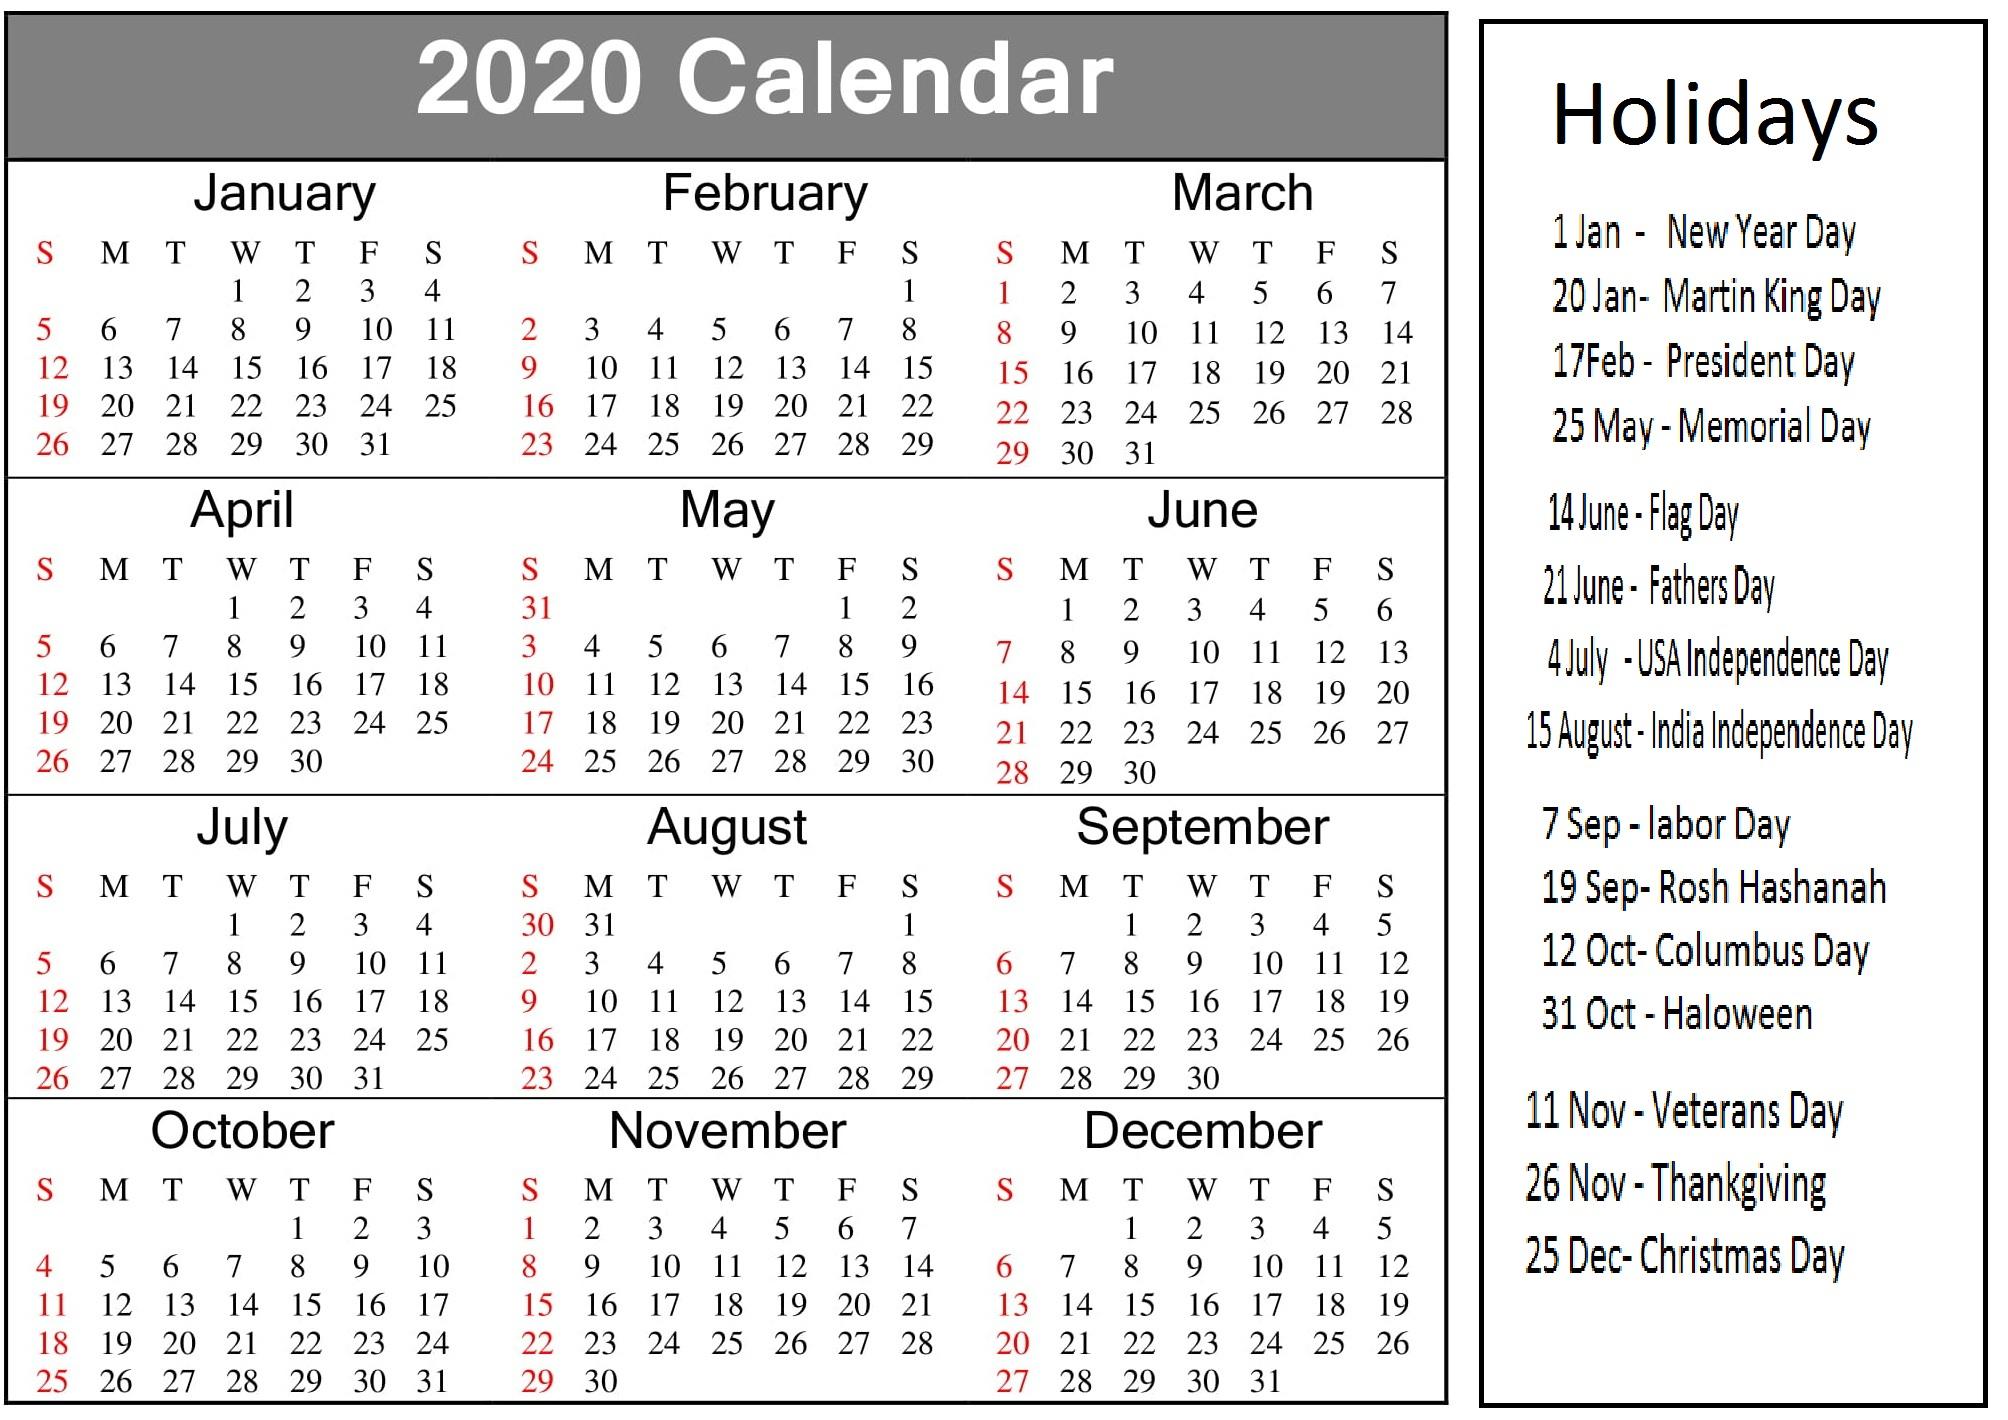 Printable 2020 Calendar With American Holidays - Latest